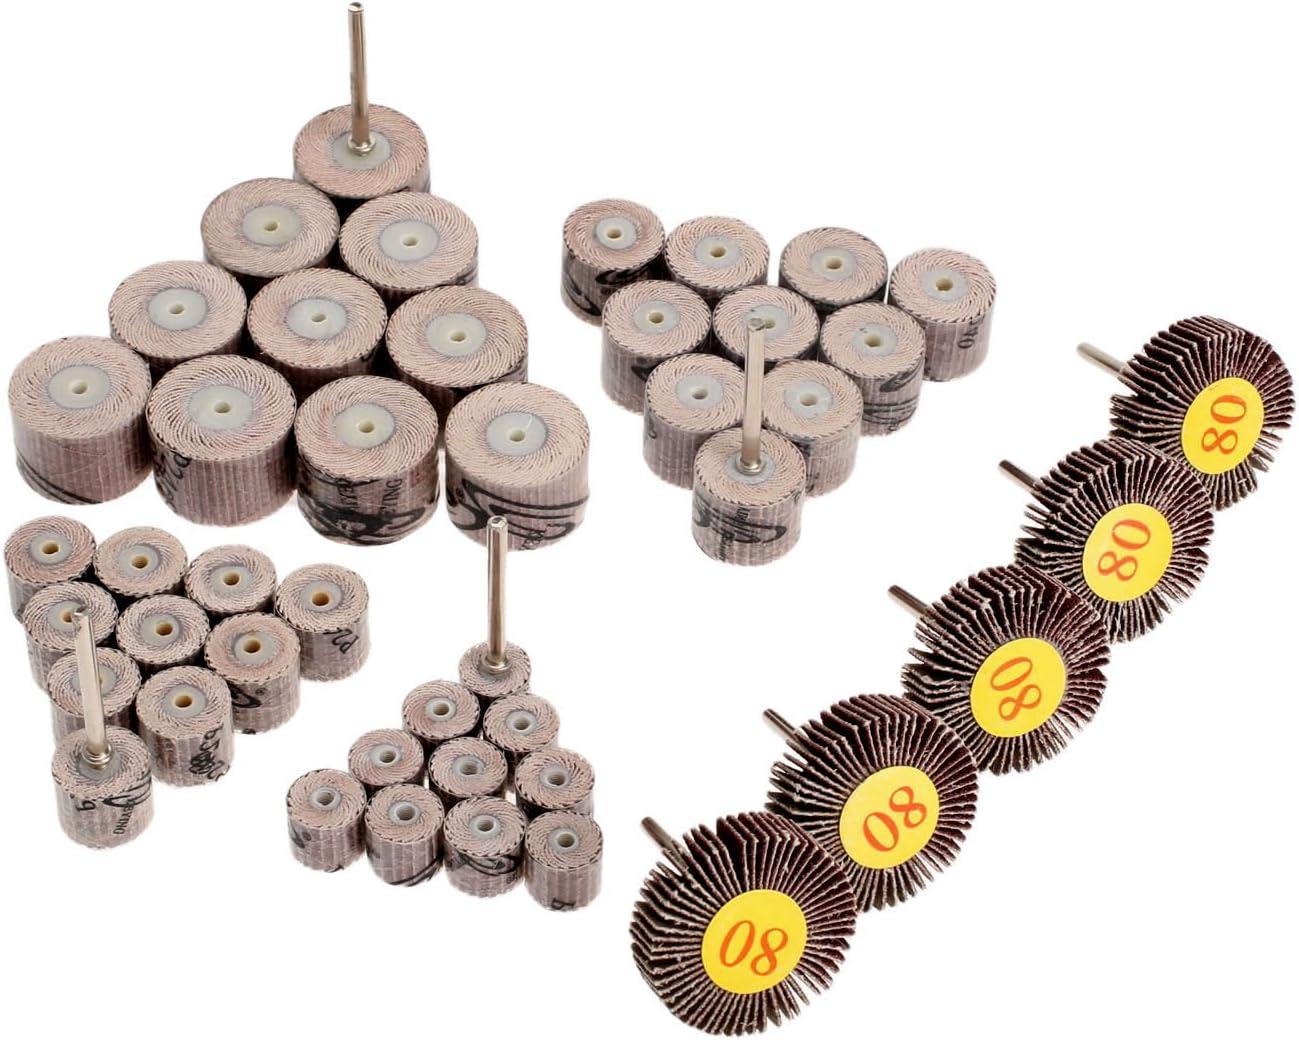 10pcs Sanding Sandpaper Flap Wheels Disc 80 Grit Grinding Polishing Rotary Tool